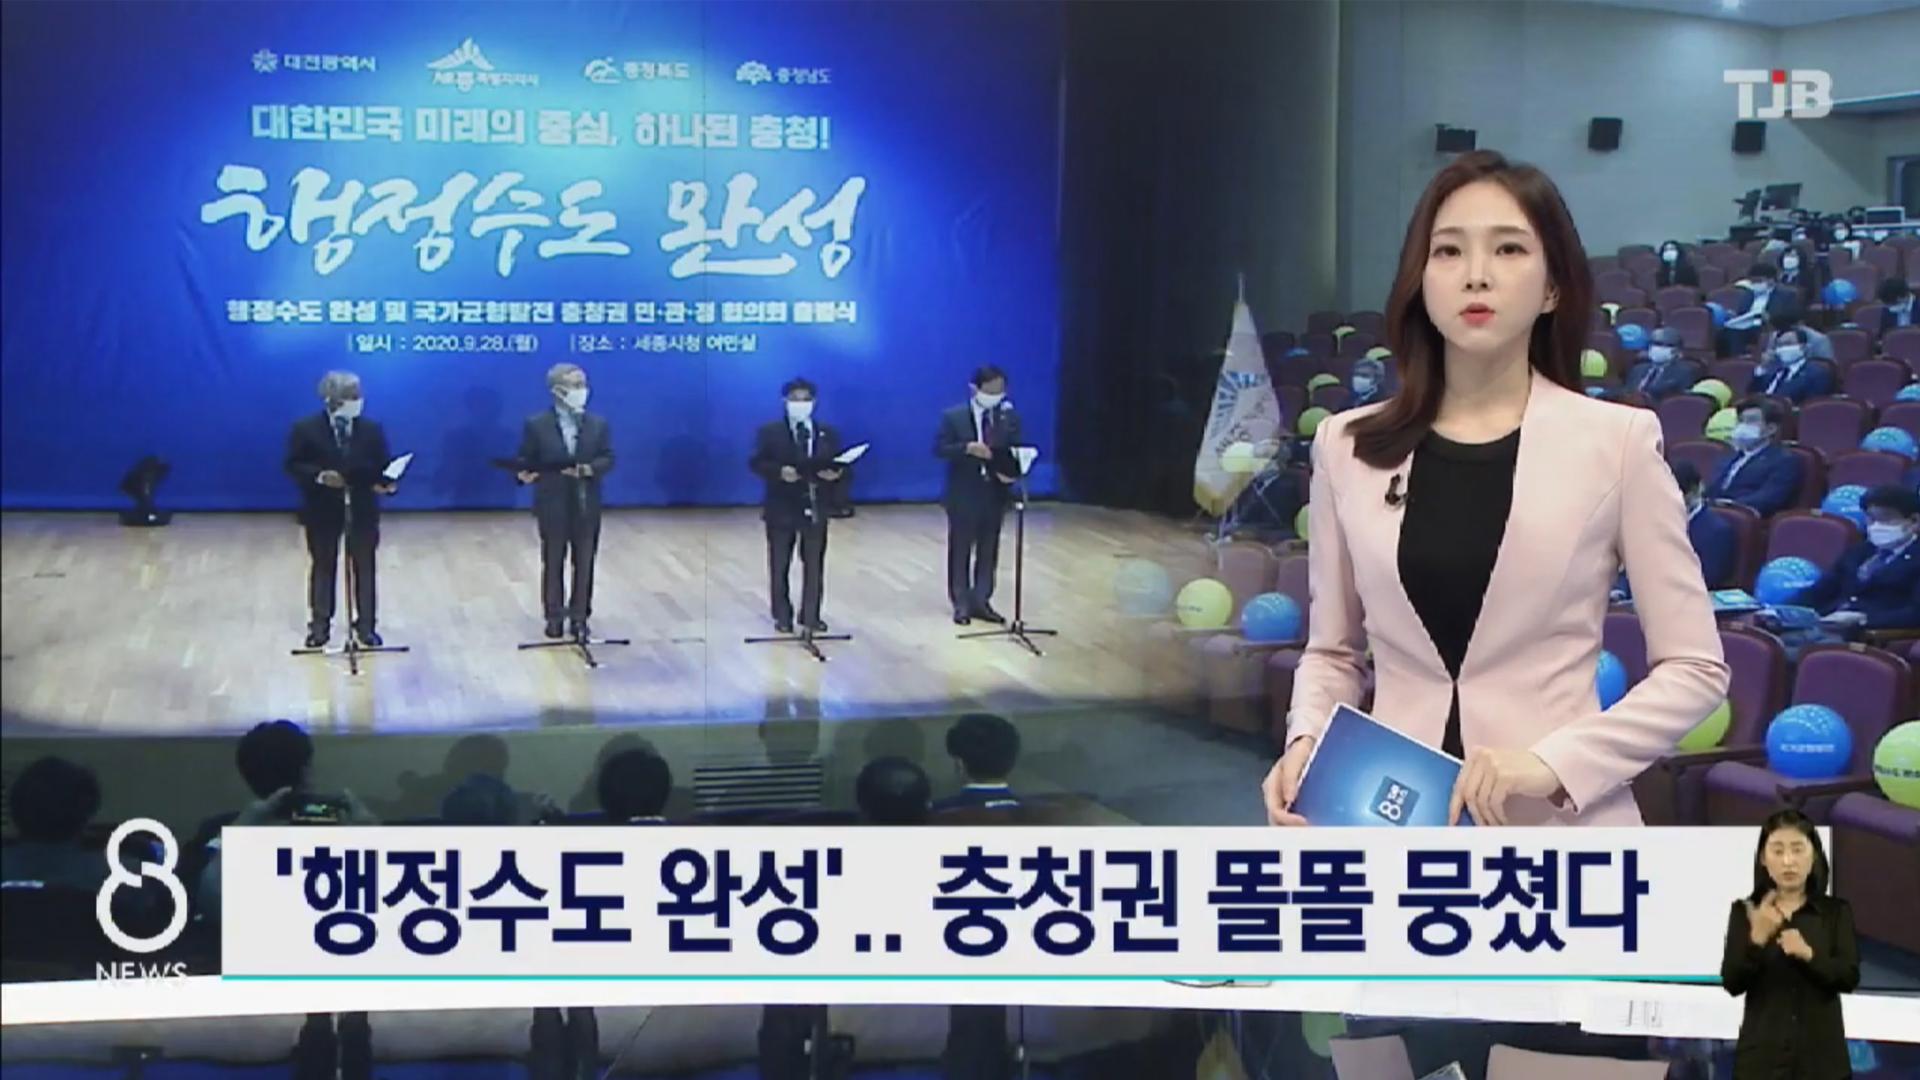 [TJB 대전·충남·세종뉴스] 행정수도 완성.. 충청권 똘똘 뭉쳤다